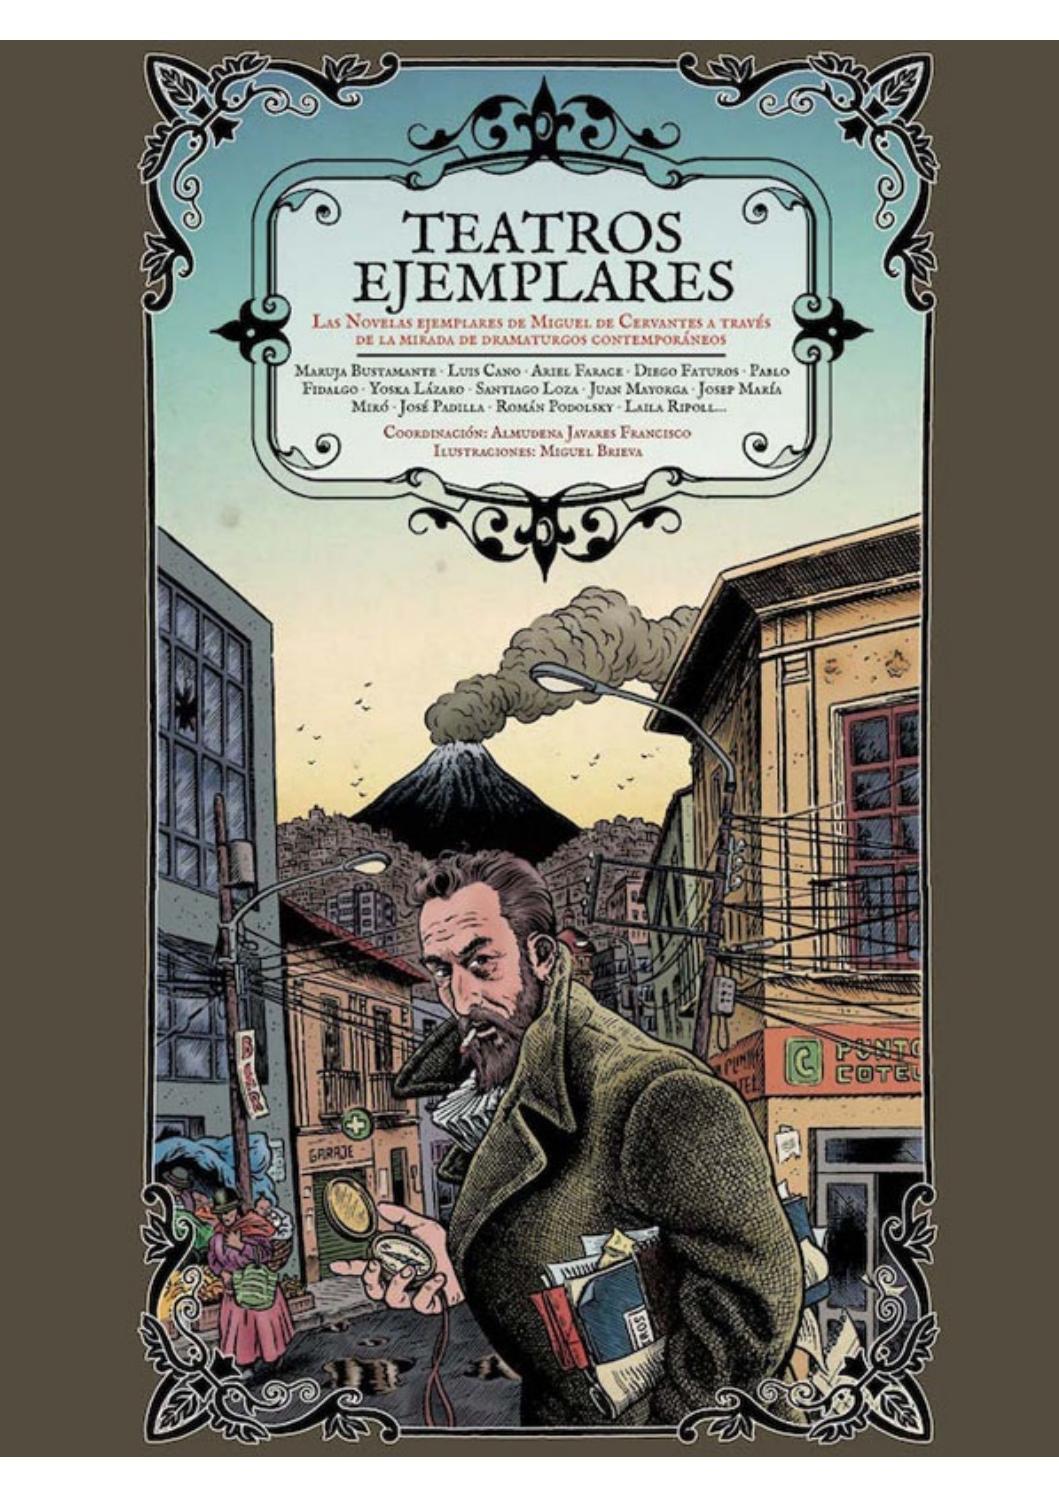 Teatros Ejemplares by AECID PUBLICACIONES - issuu a1160e6295a